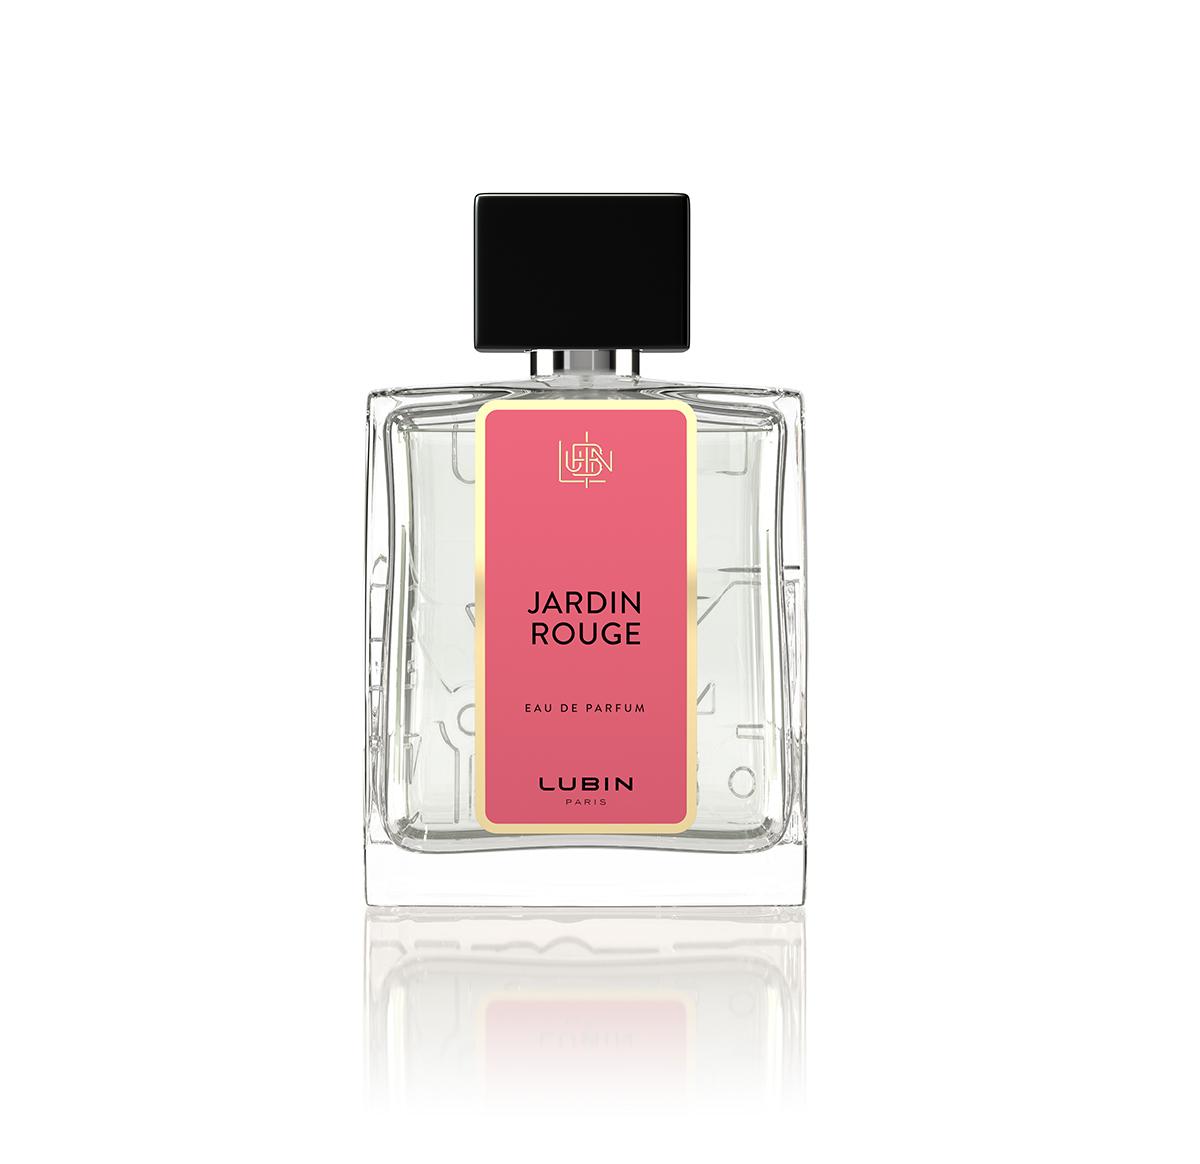 Jardin Rouge 75Ml Edp Spray | Pulse Of Perfumery à Malle Jardin